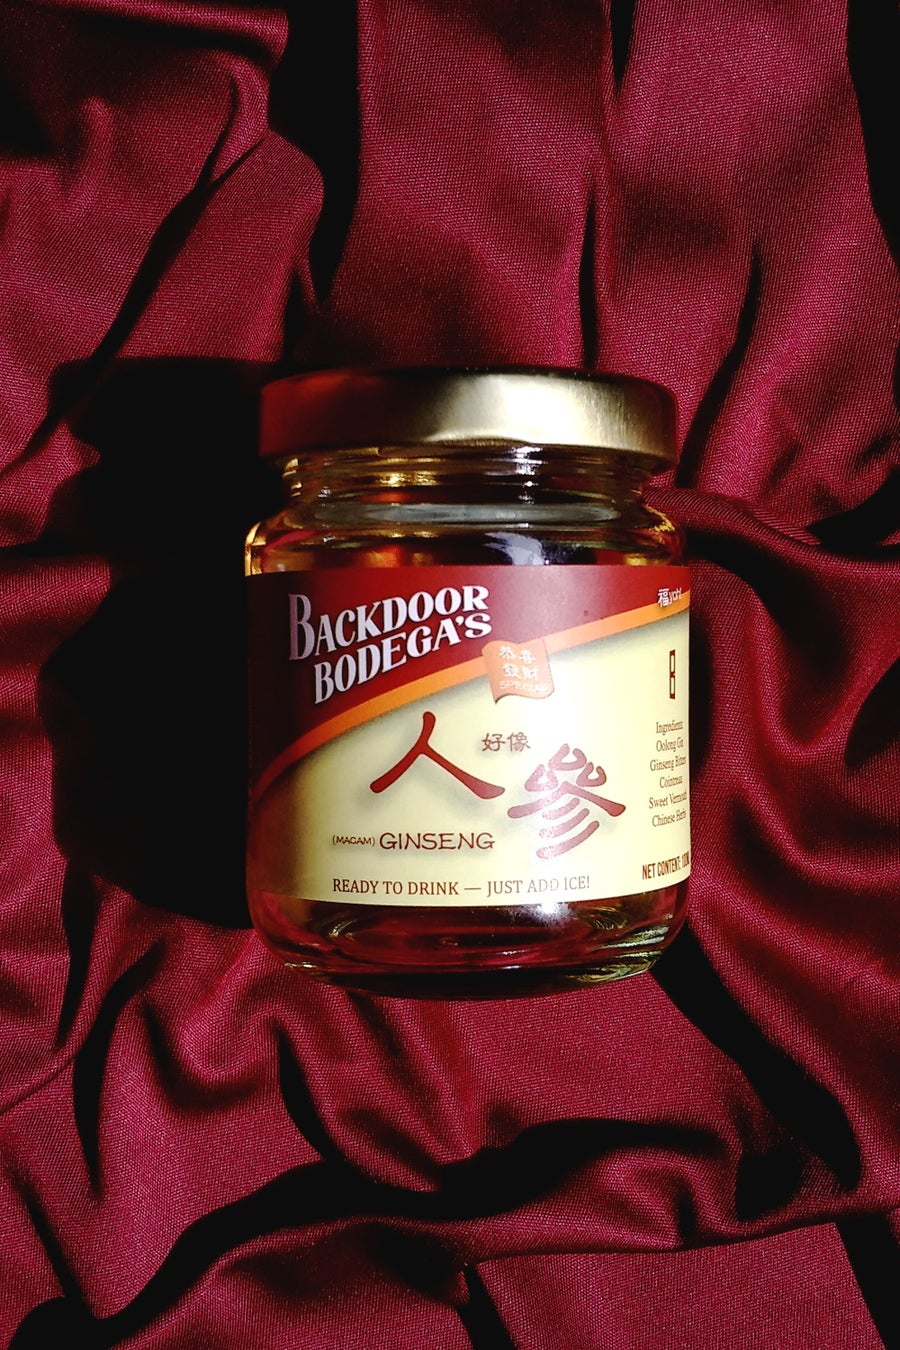 Image of (Macam) Ginseng